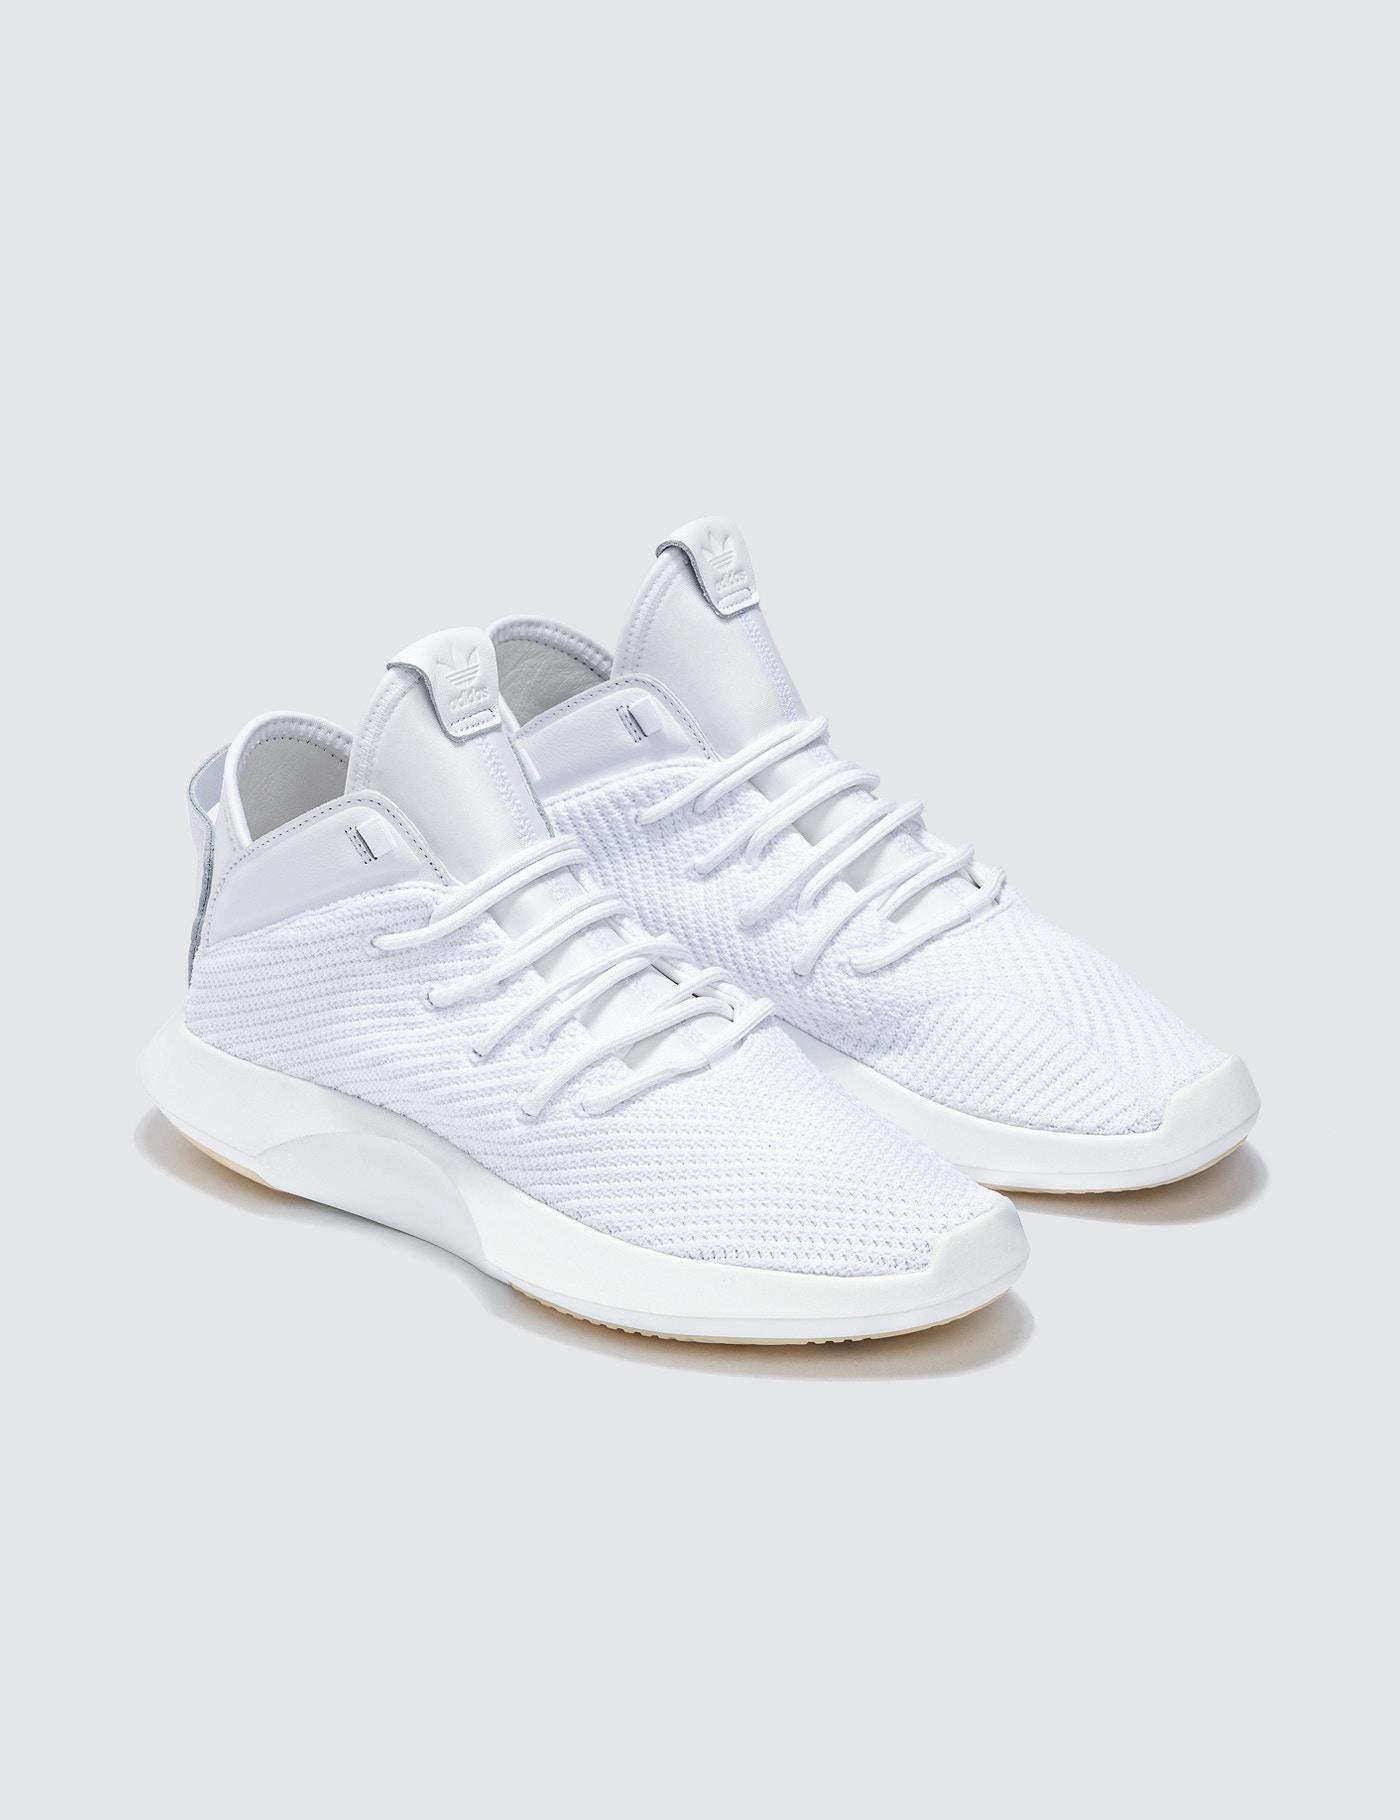 the best attitude 68be2 6cb84 adidas Originals Crazy 1 Adv Primeknit in White for Men - Ly